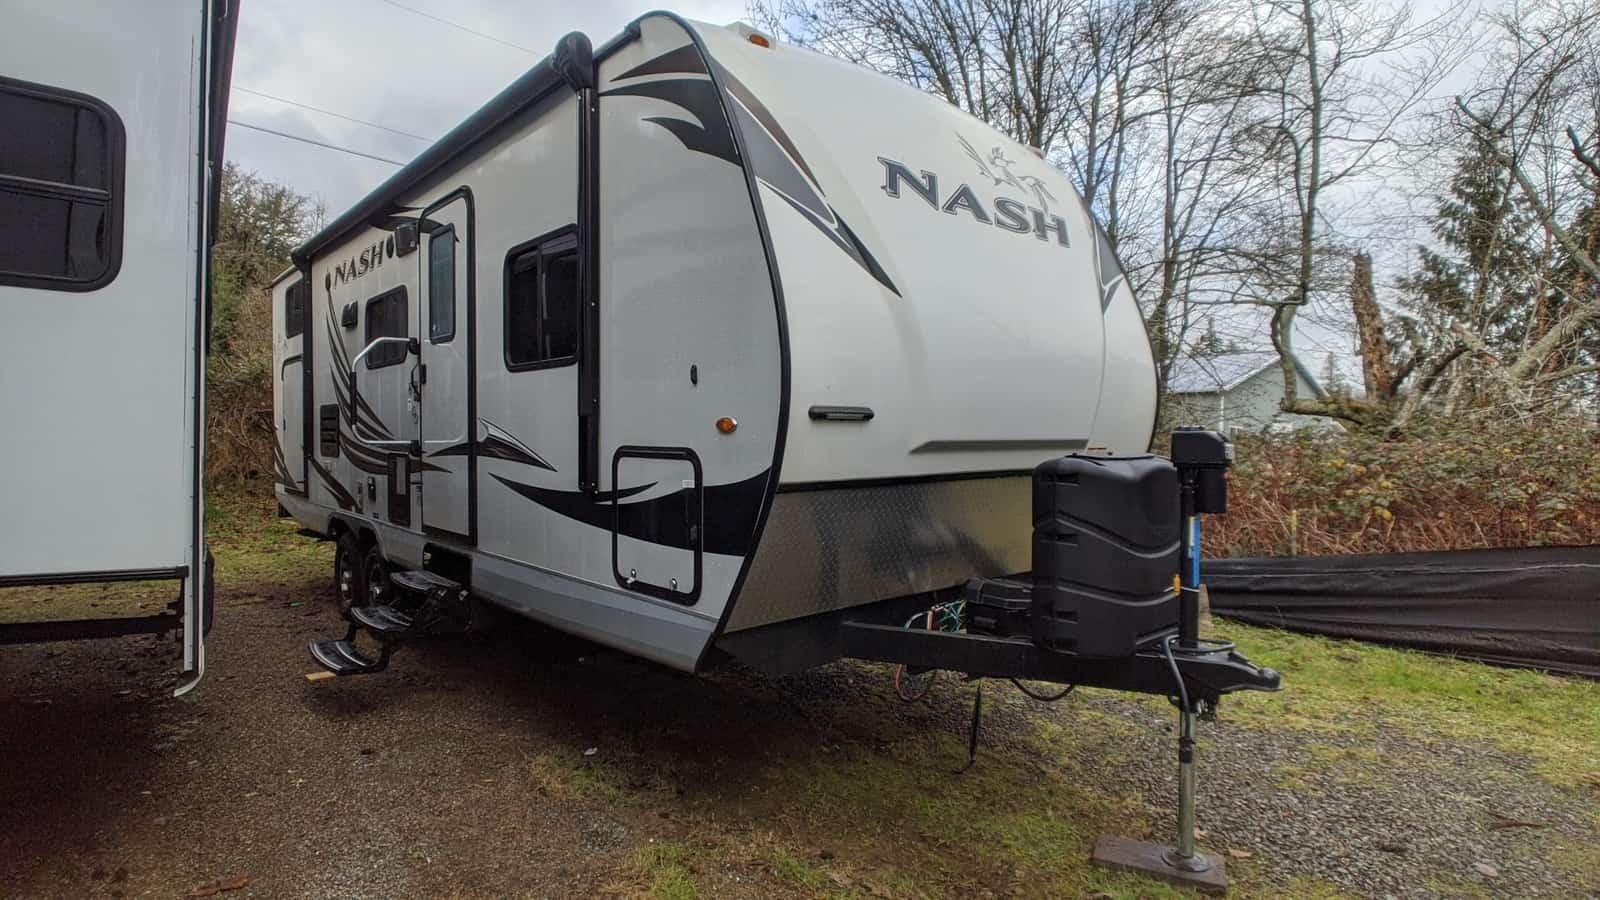 USED 2019 Northwood Nash 24B